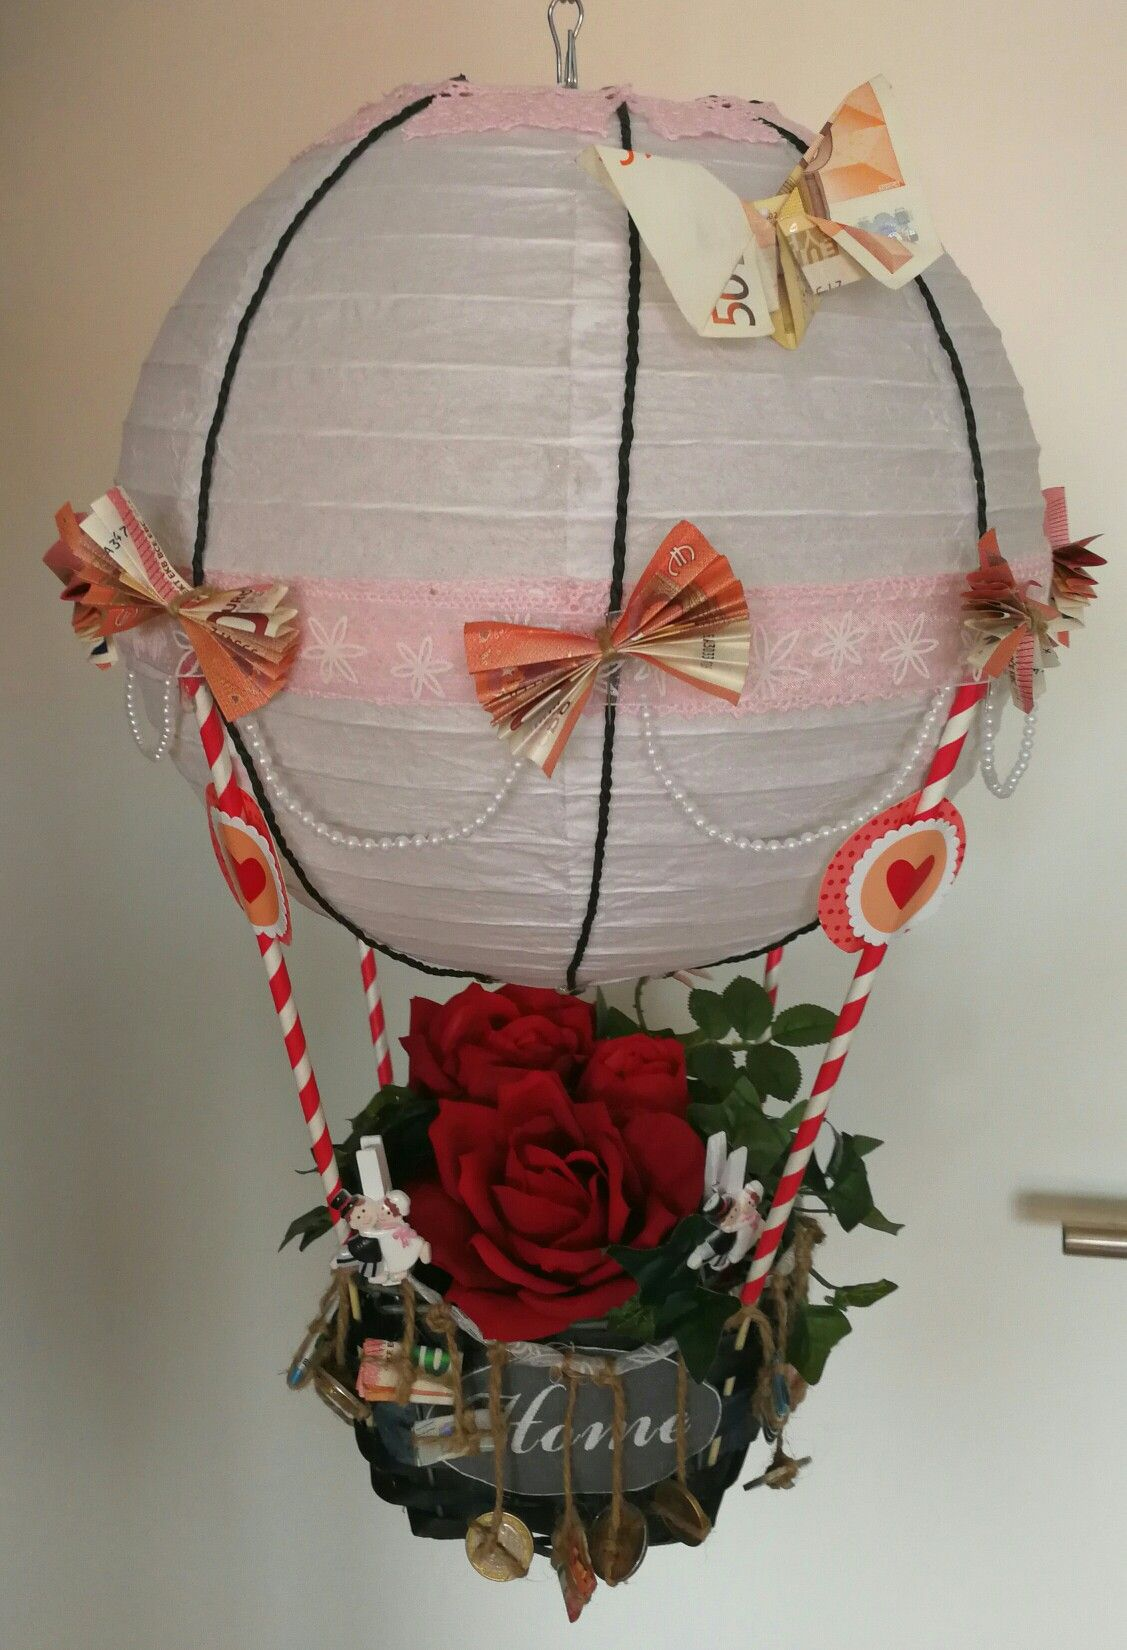 diy hei luftballon geldgeschenk von kollegen f r brautpaar geschenk ideen pinterest. Black Bedroom Furniture Sets. Home Design Ideas